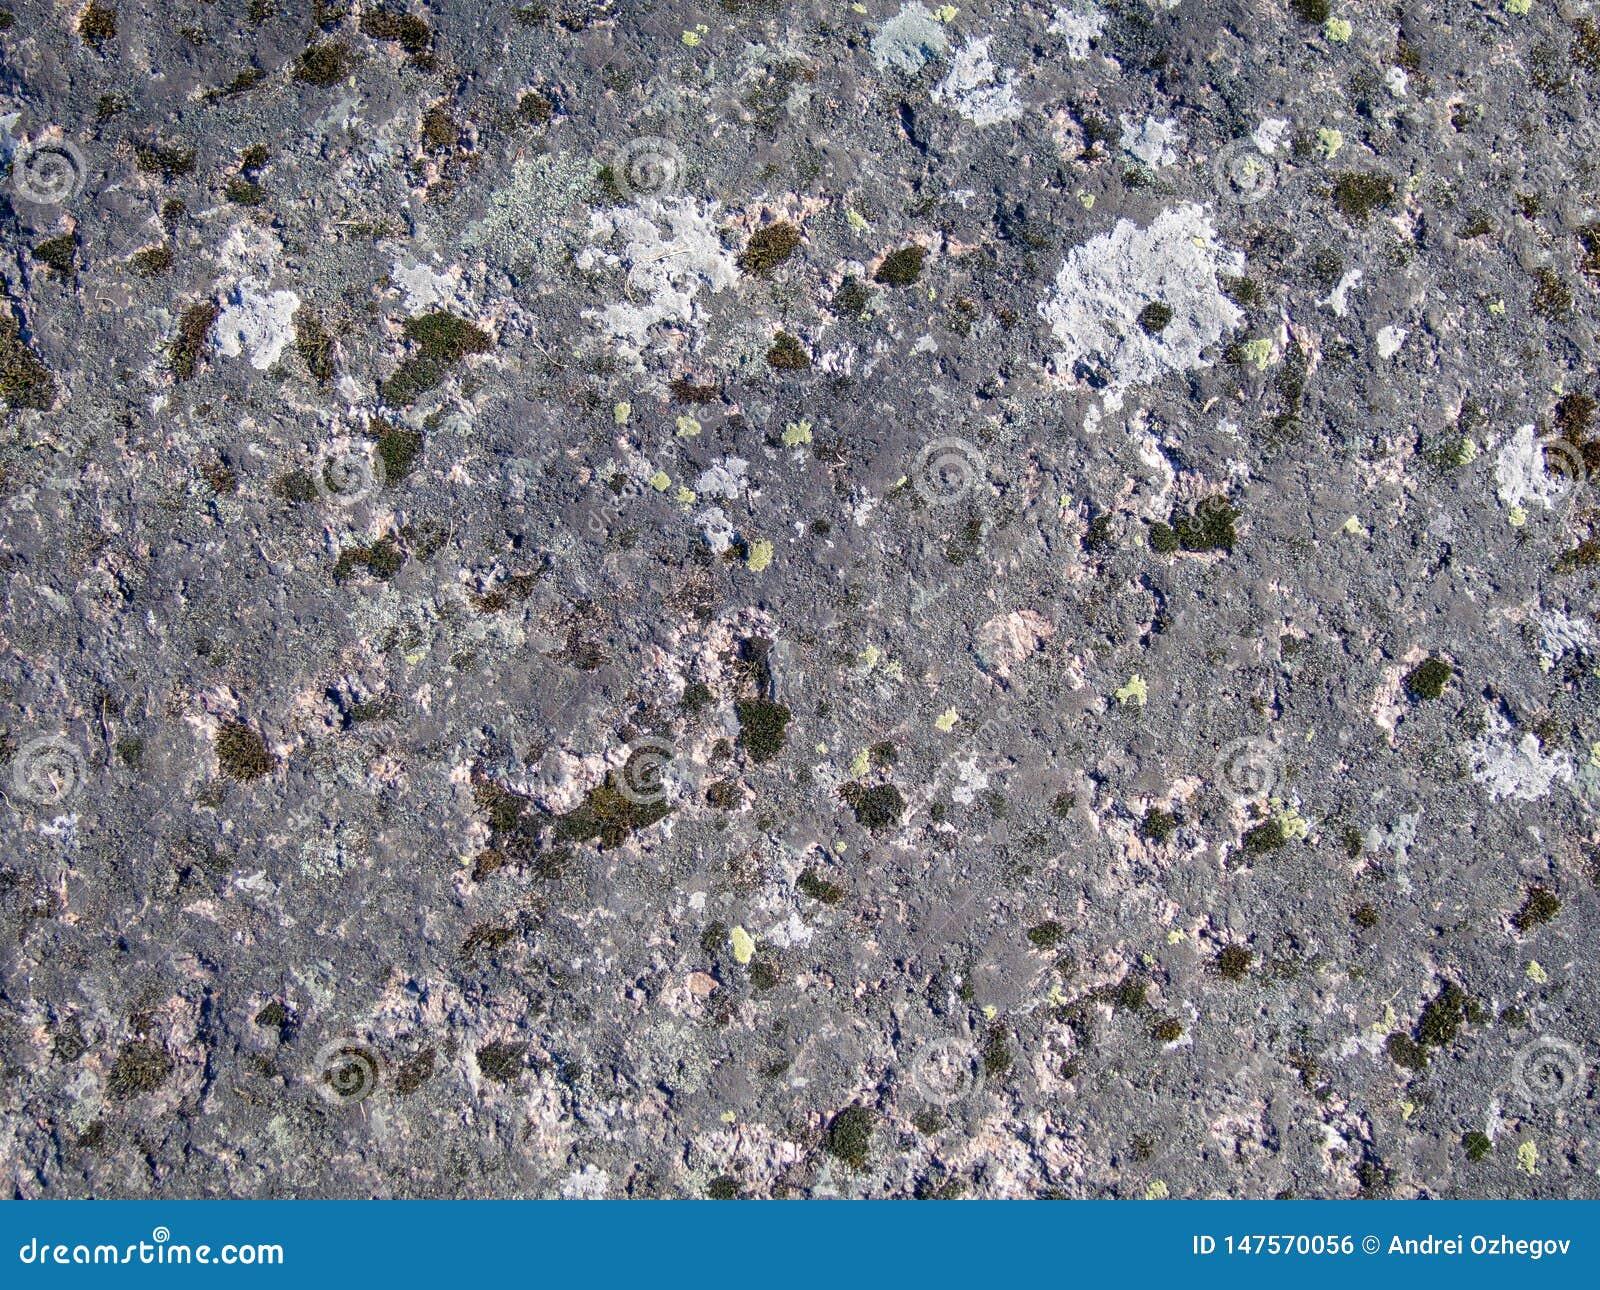 Textura de la piedra cubierta de musgo natural vieja